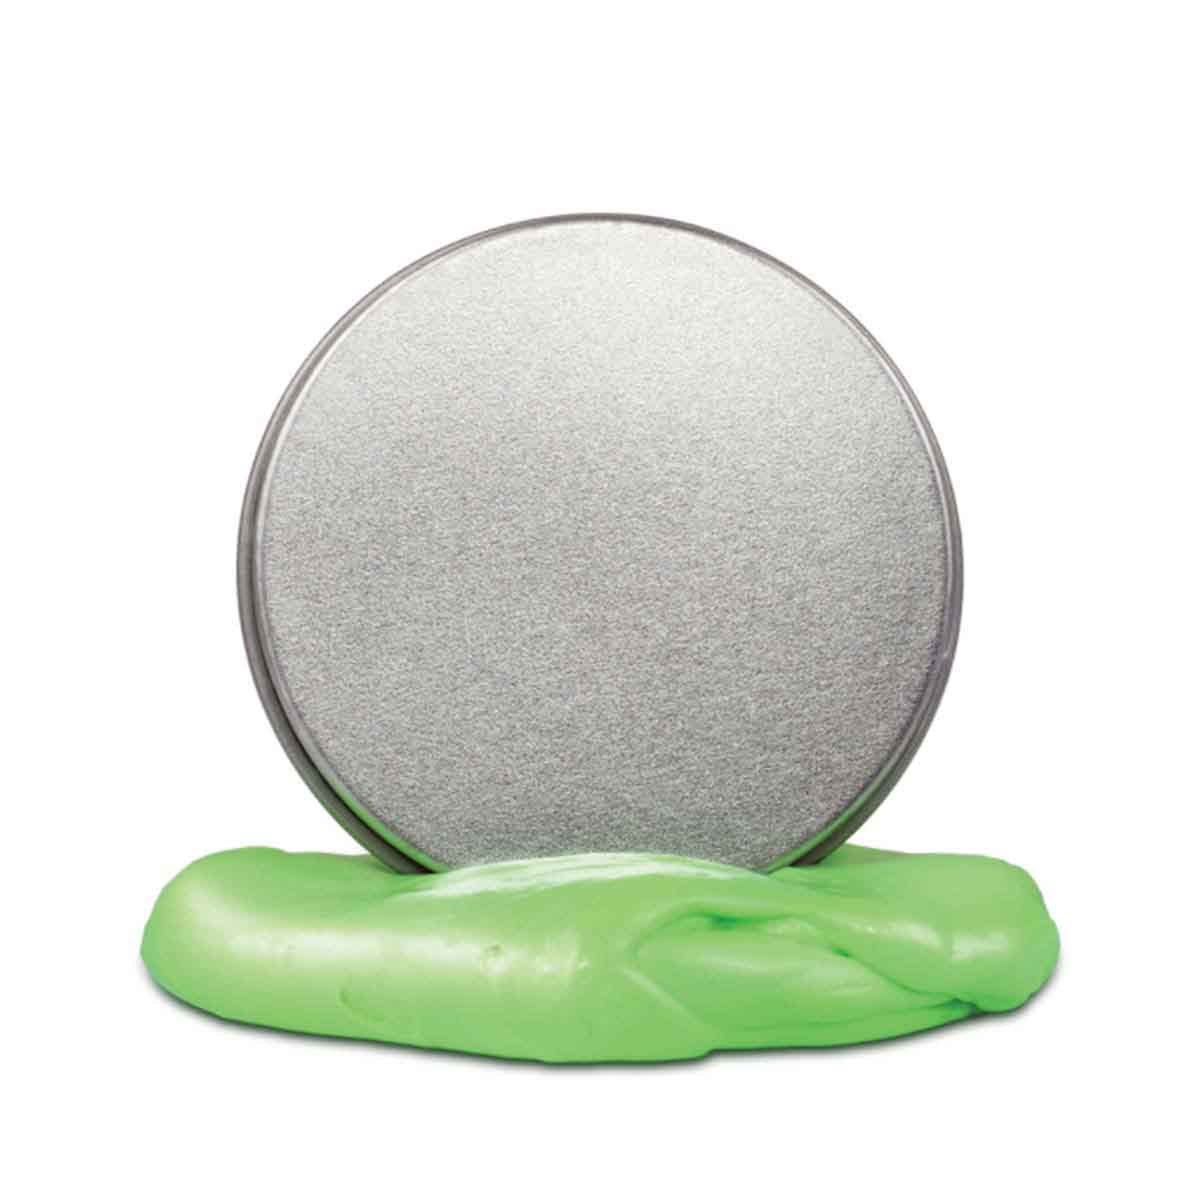 Clegg smartputty green